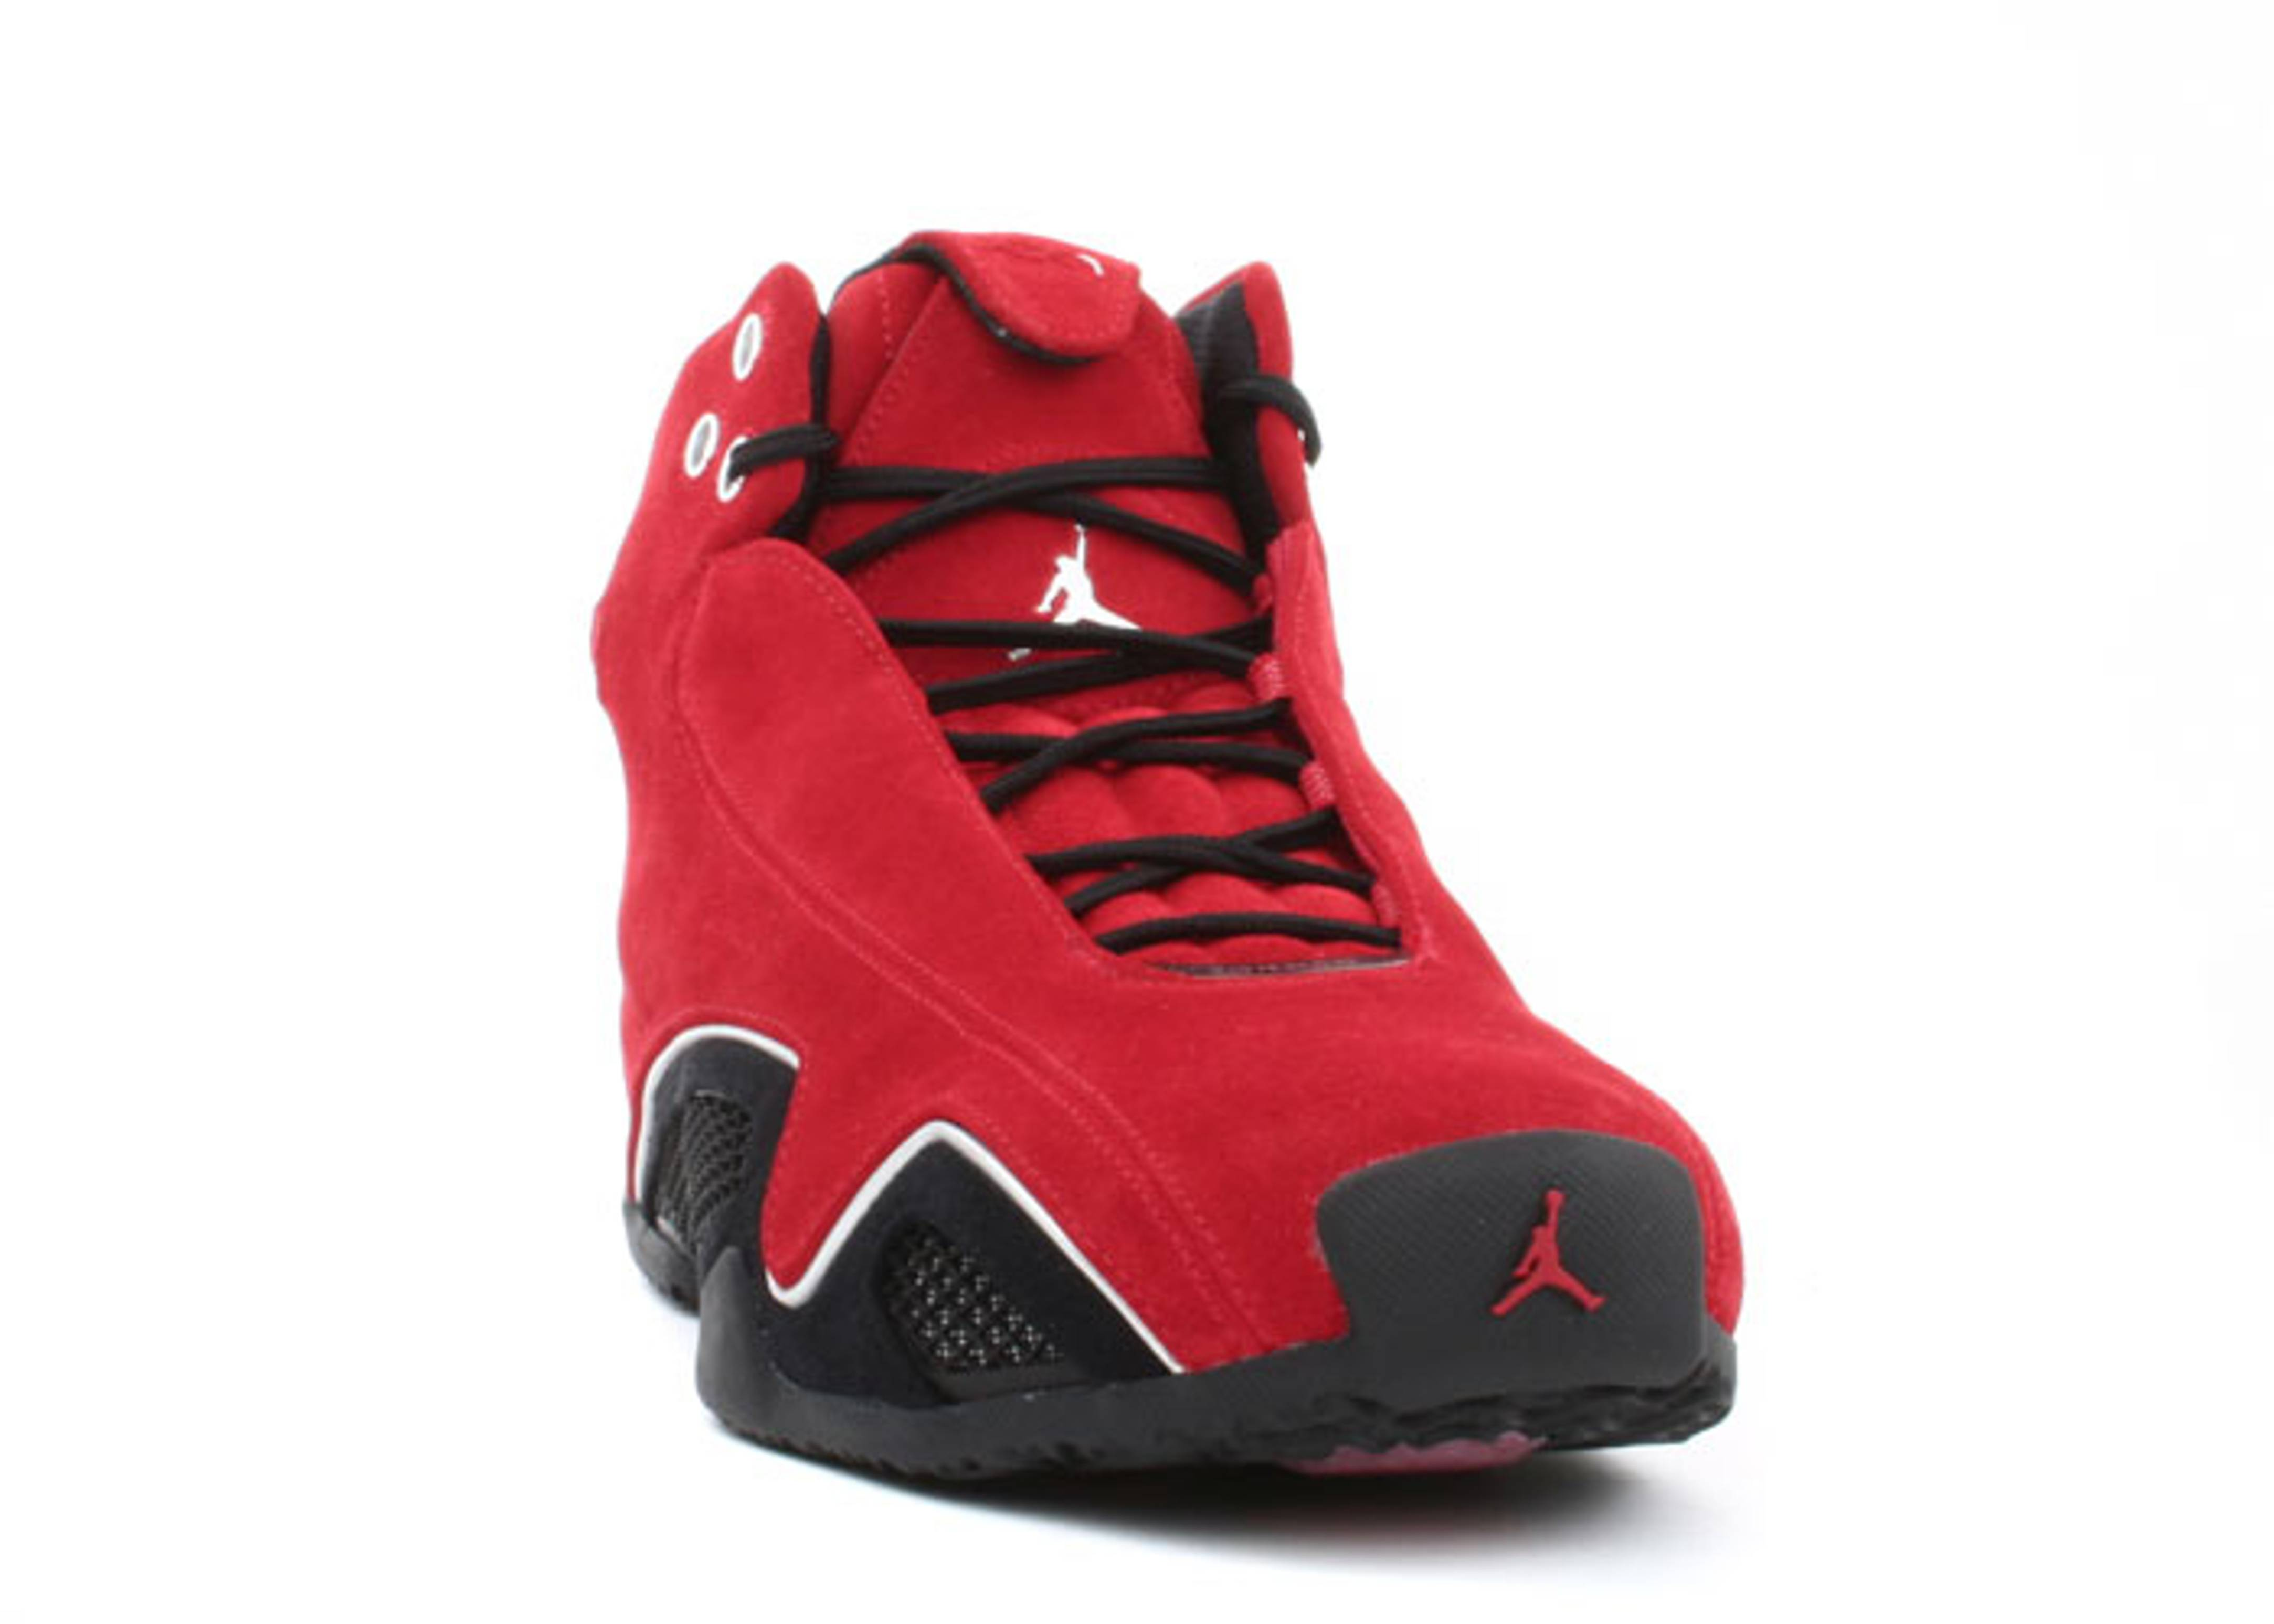 Jordan Flight Black Suede Shoes